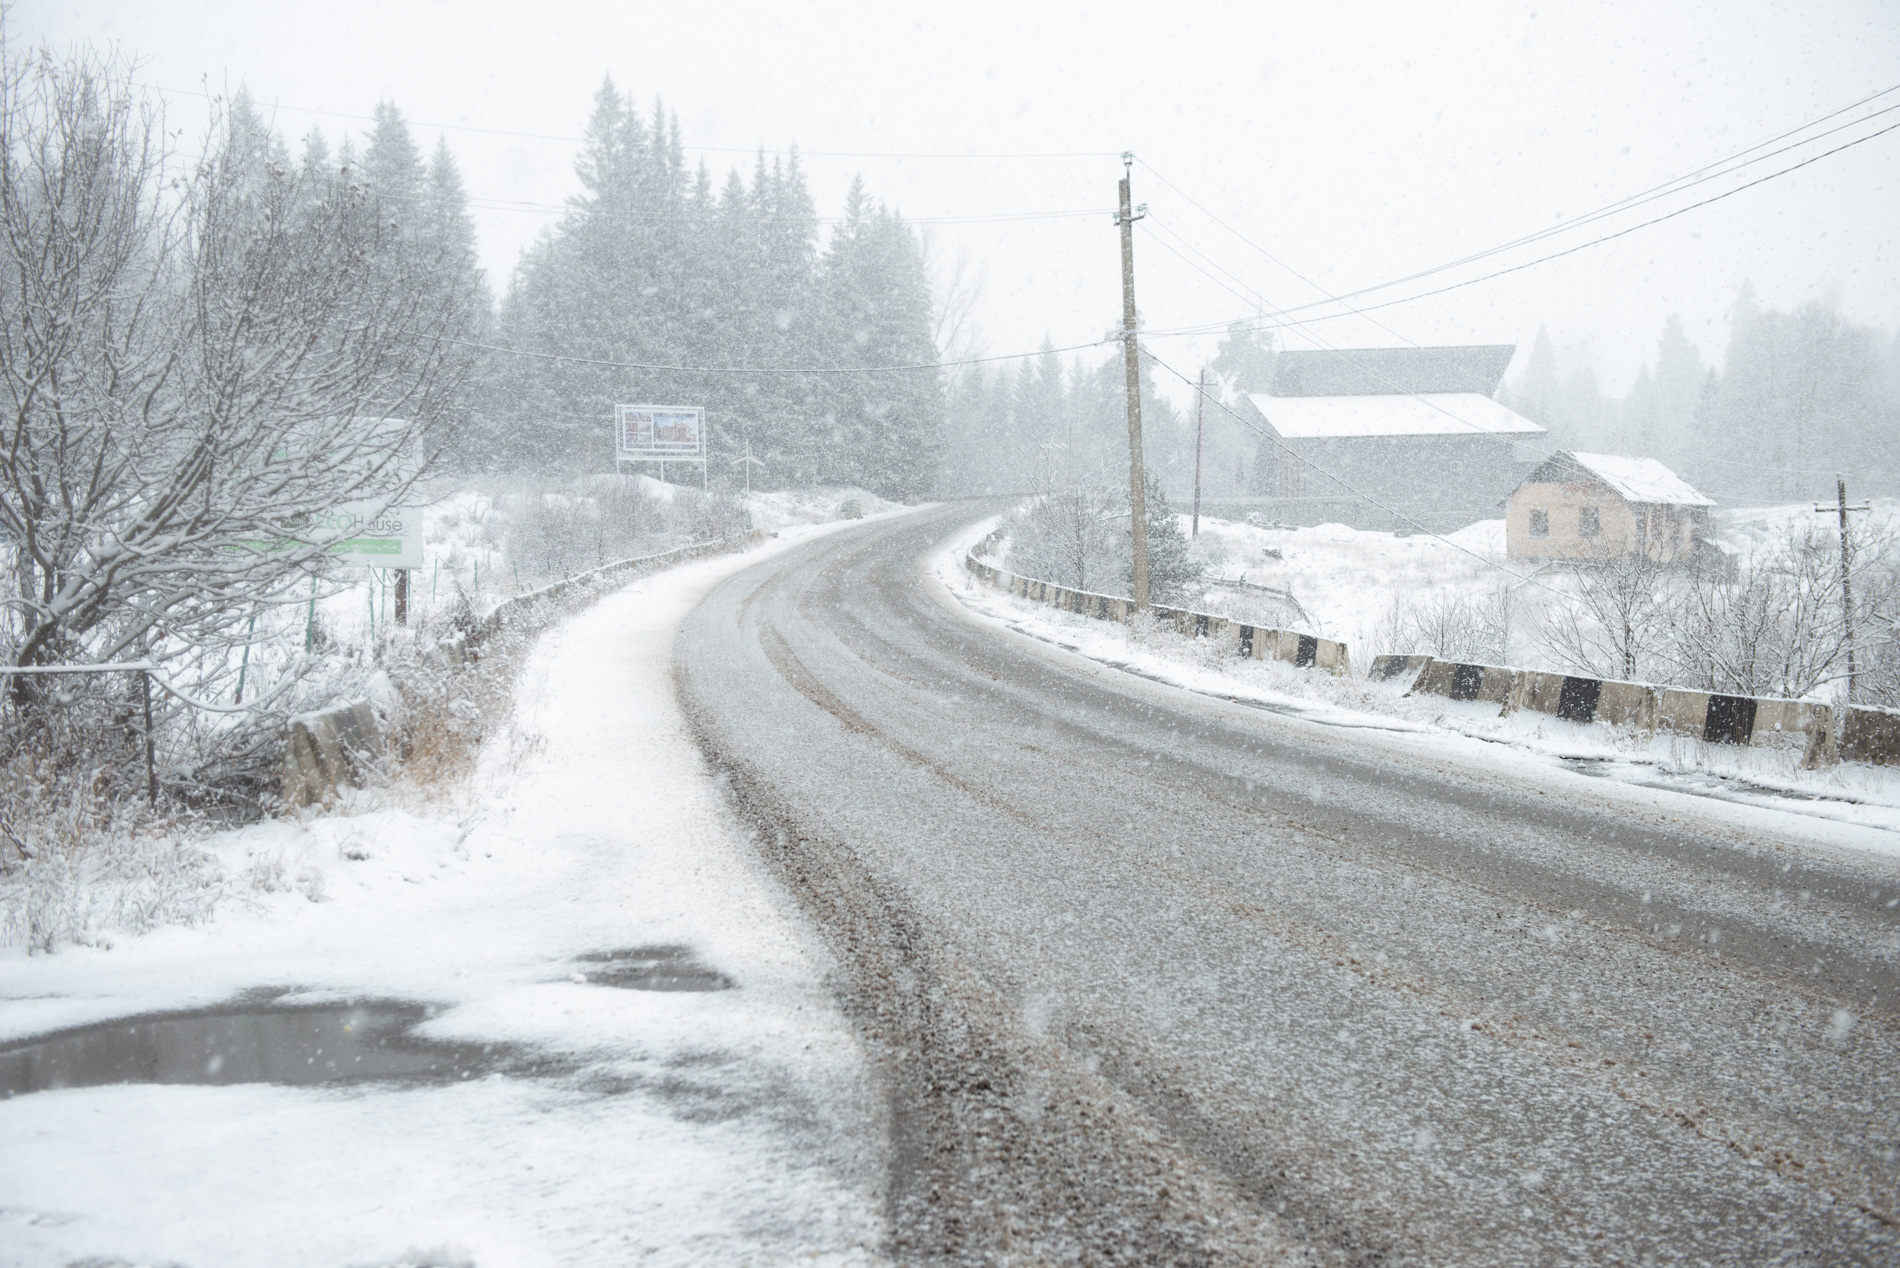 'We used to start working as soon as the good snow fell', Asmat Melikishvili, cottage administrator in Bakuriani. Photo: Tamuna Chkareuli/OC Media.